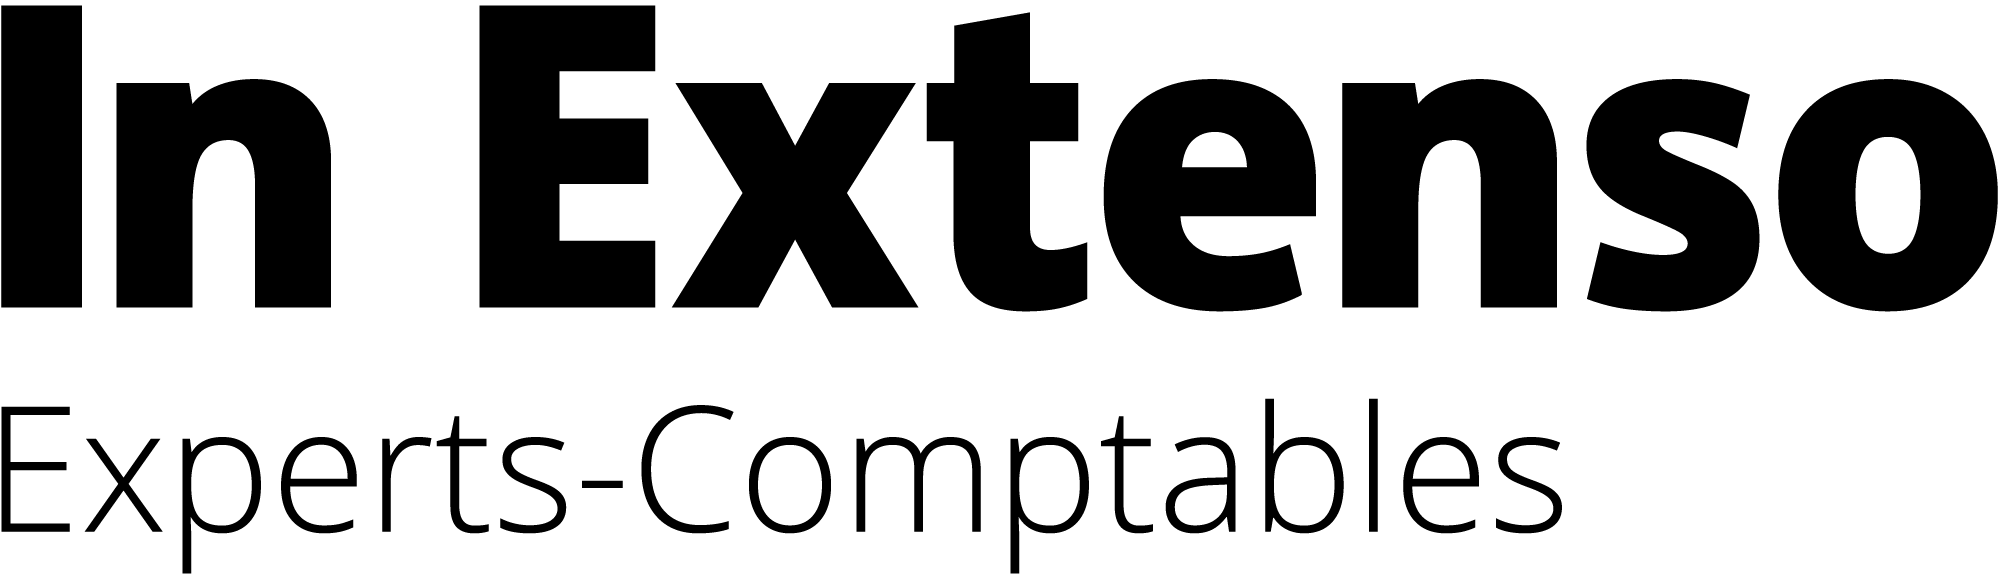 Logo de l'exposant : IN EXTENSO